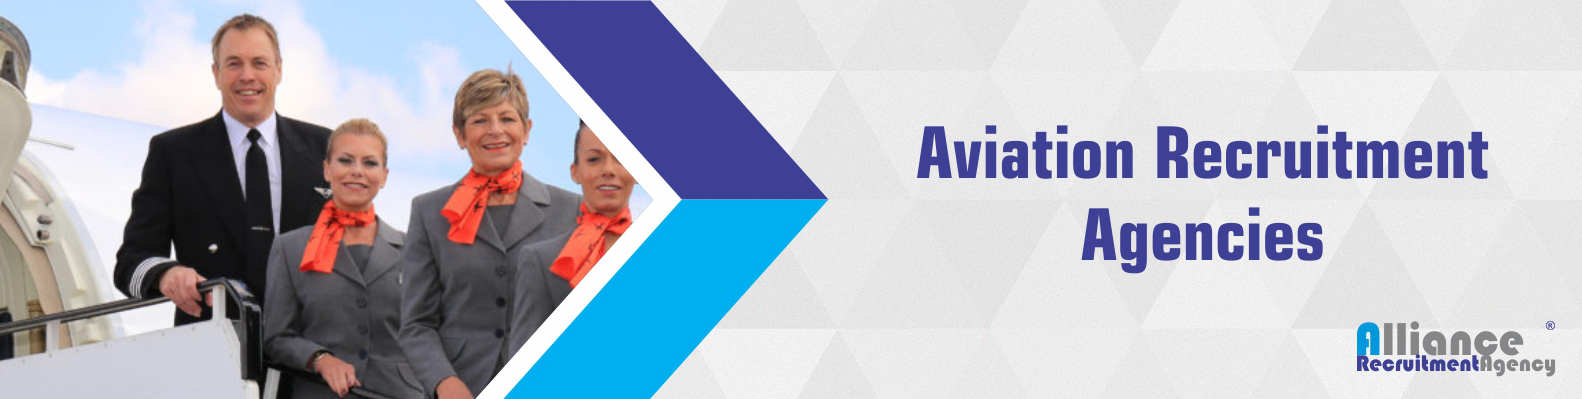 Aviation Recruitment Agencies - Aviation Recruiting Companies